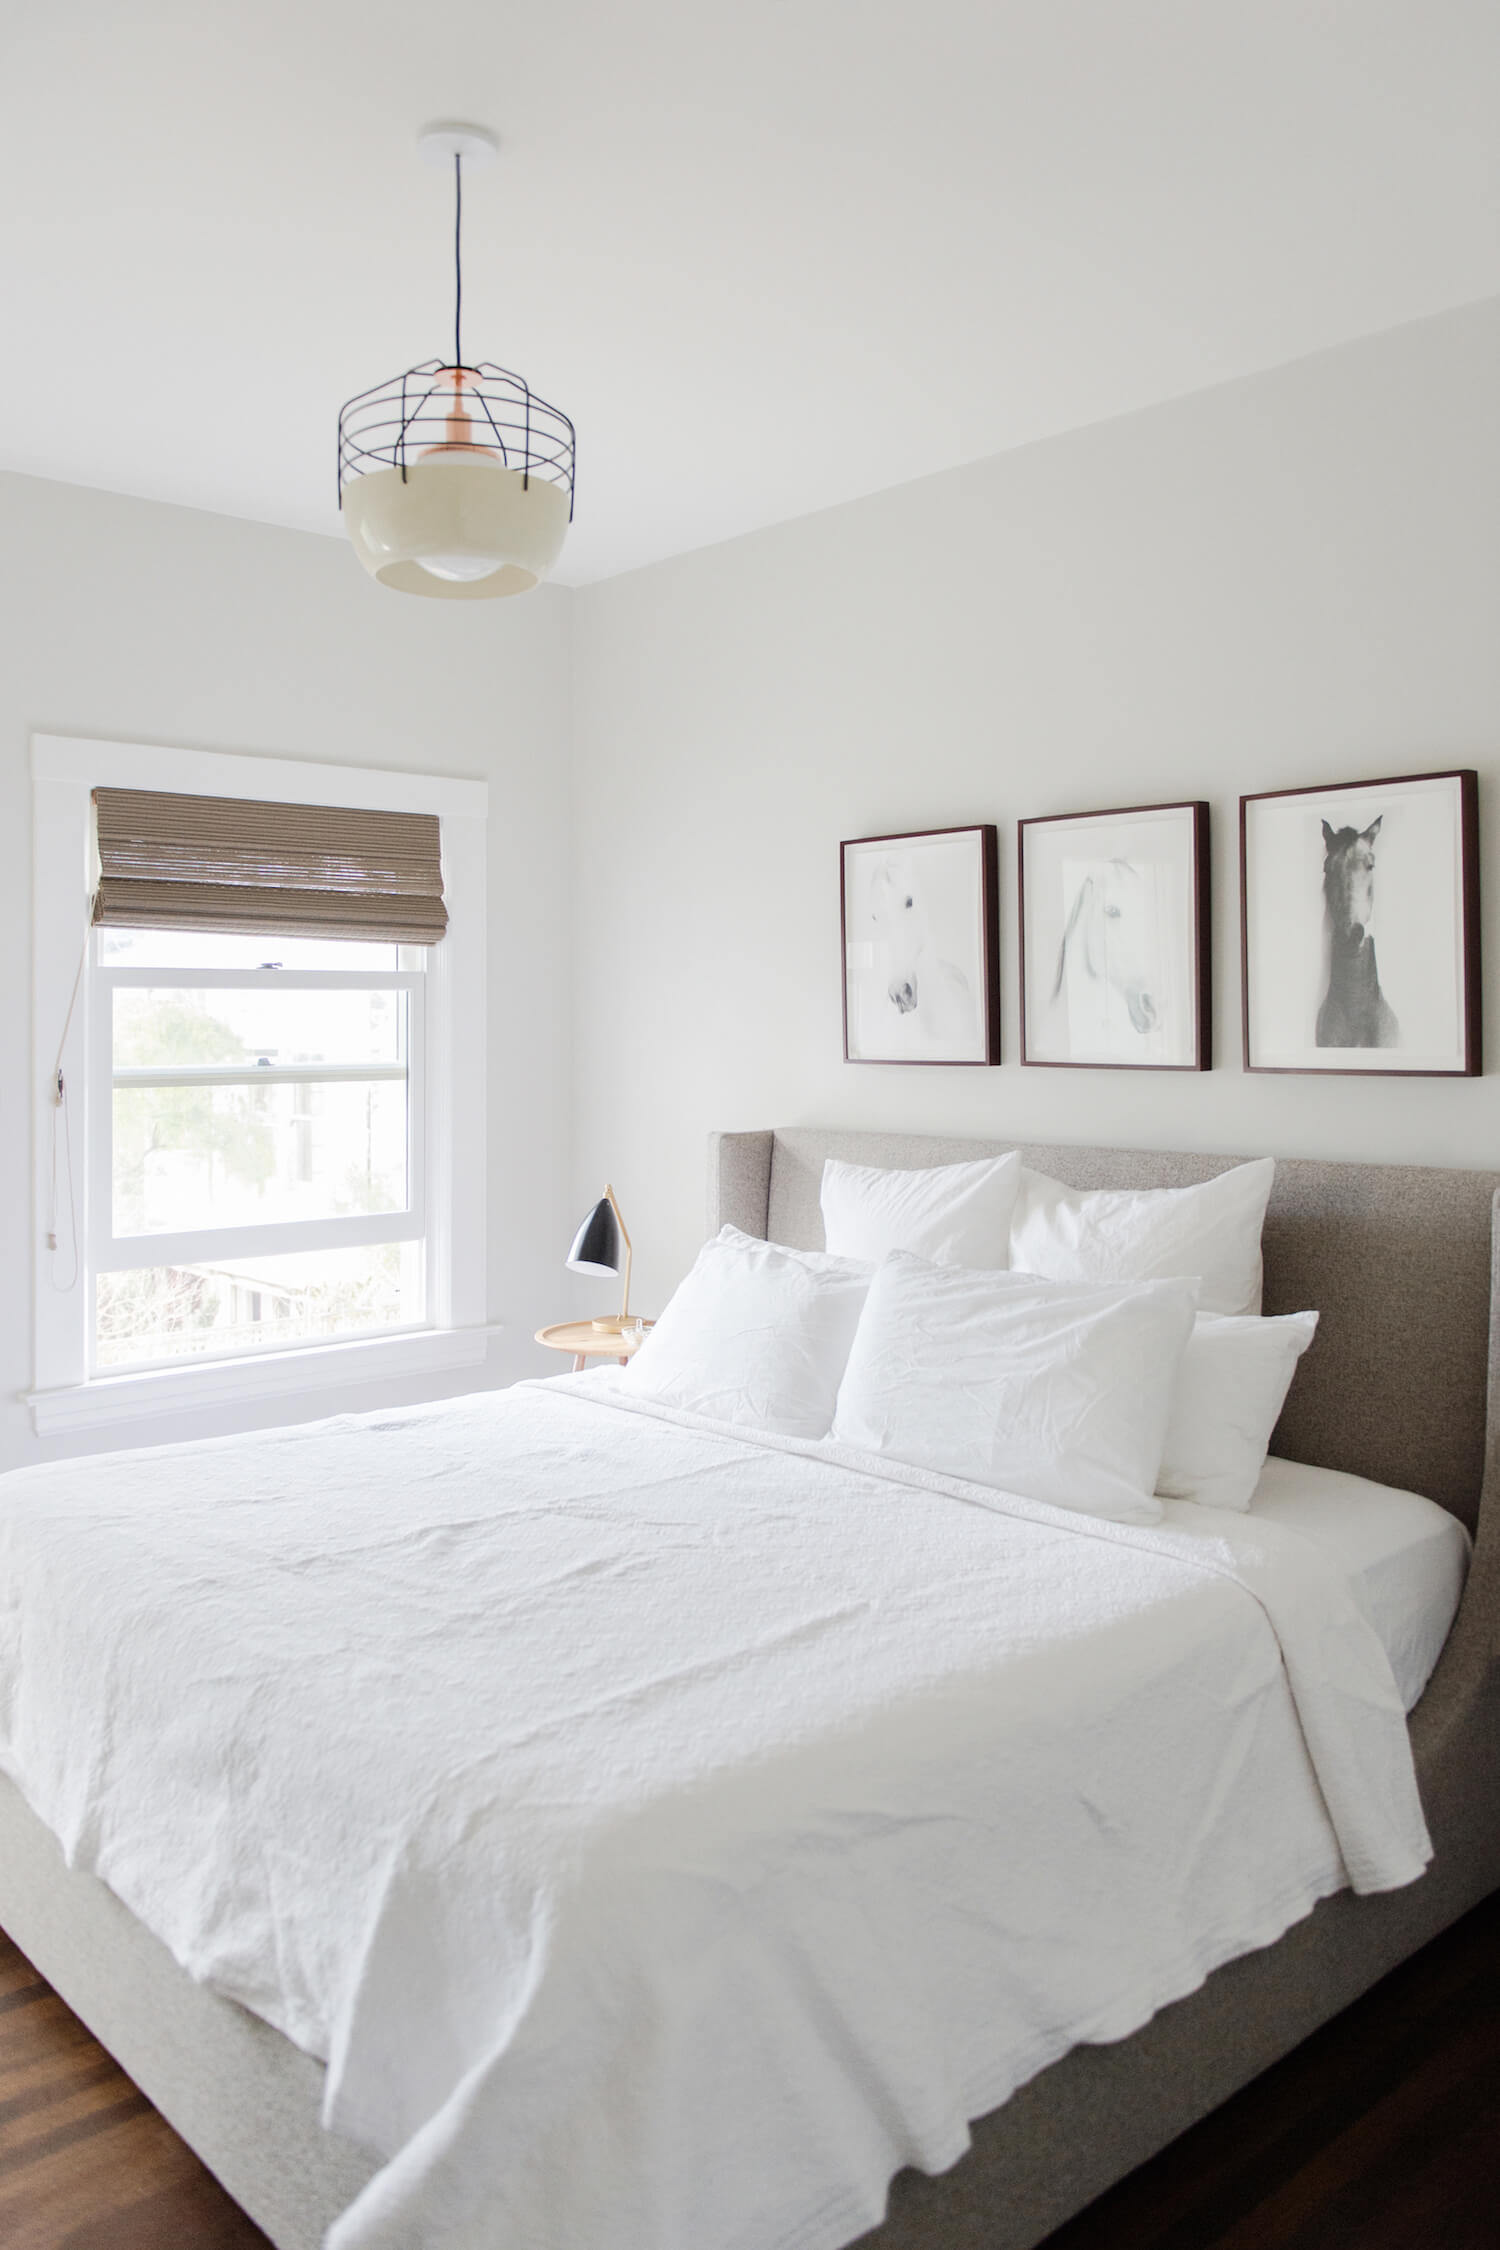 est-living-interiors-vif-studio-richmond-home-san-francisco-revised-5.jpg